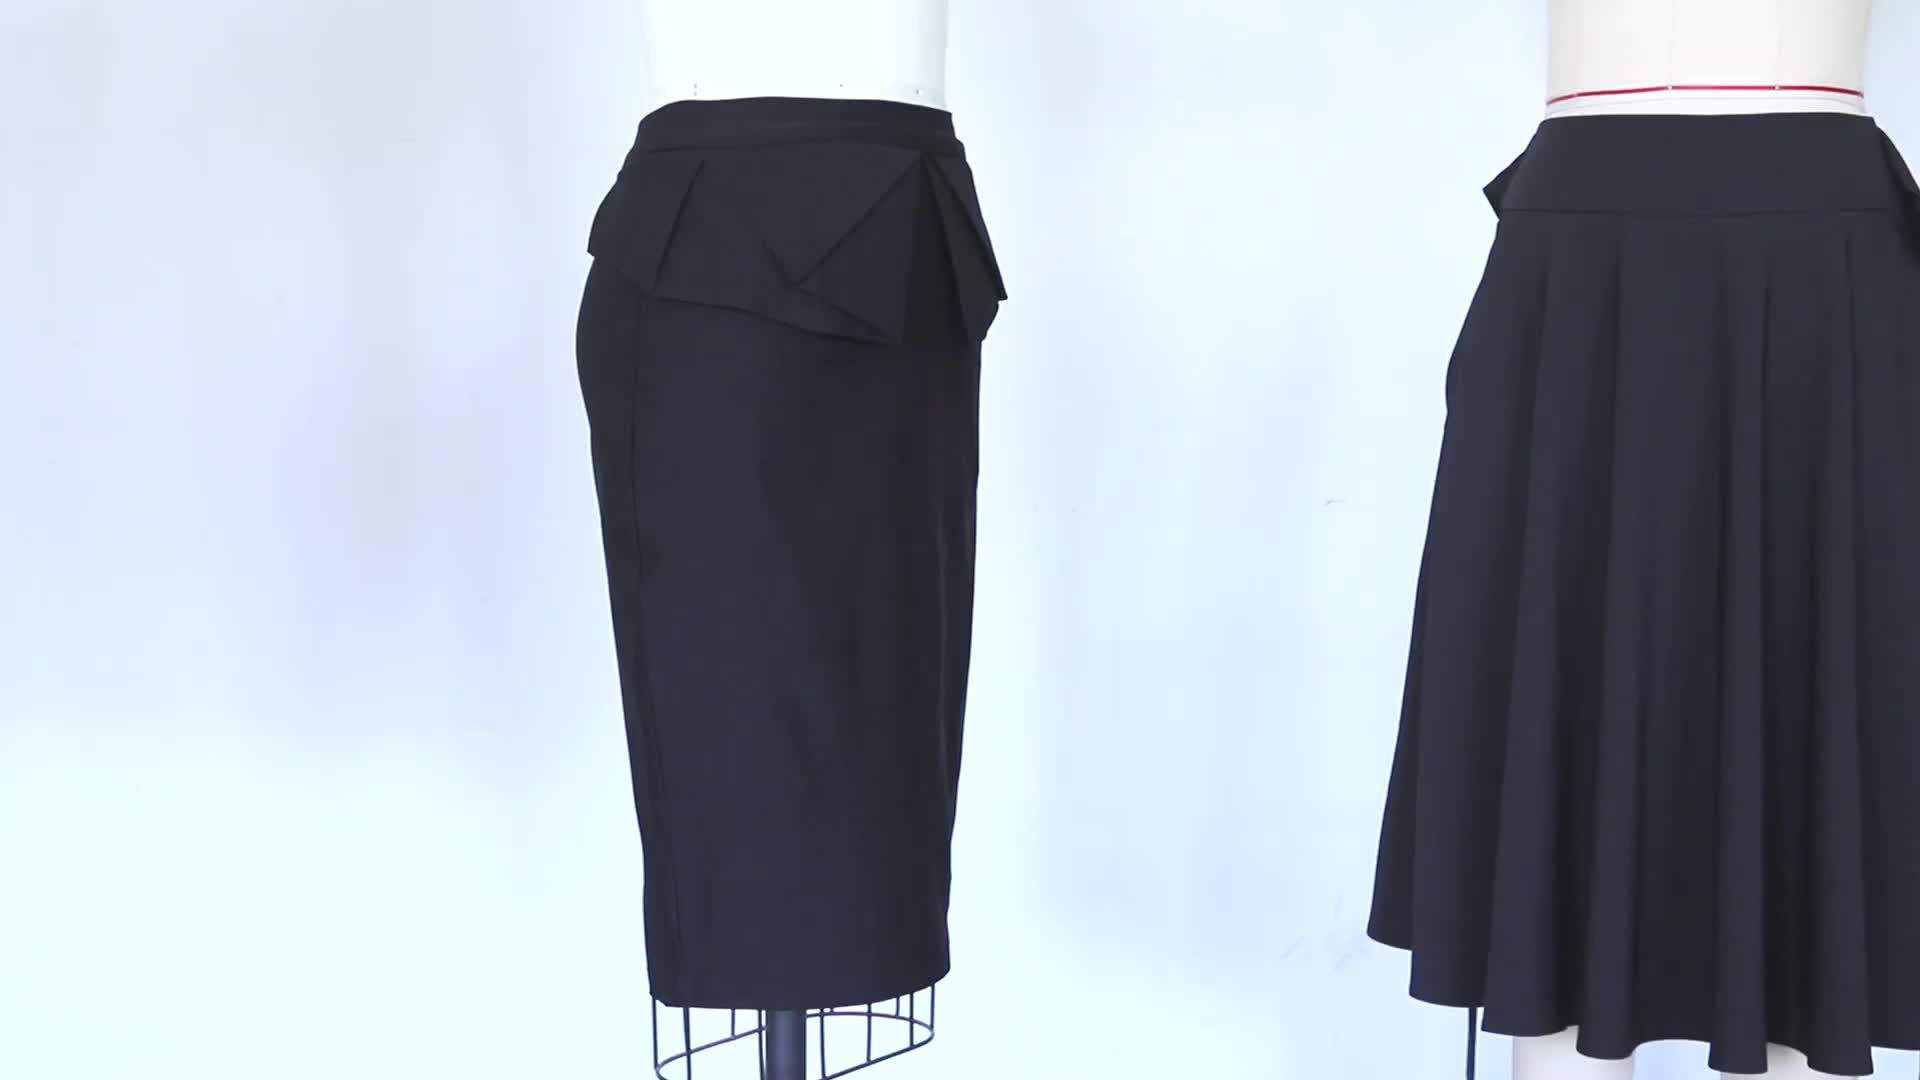 Kk001162女性無地非対称ラップフロント伸縮性ボディコンペンシルスカート